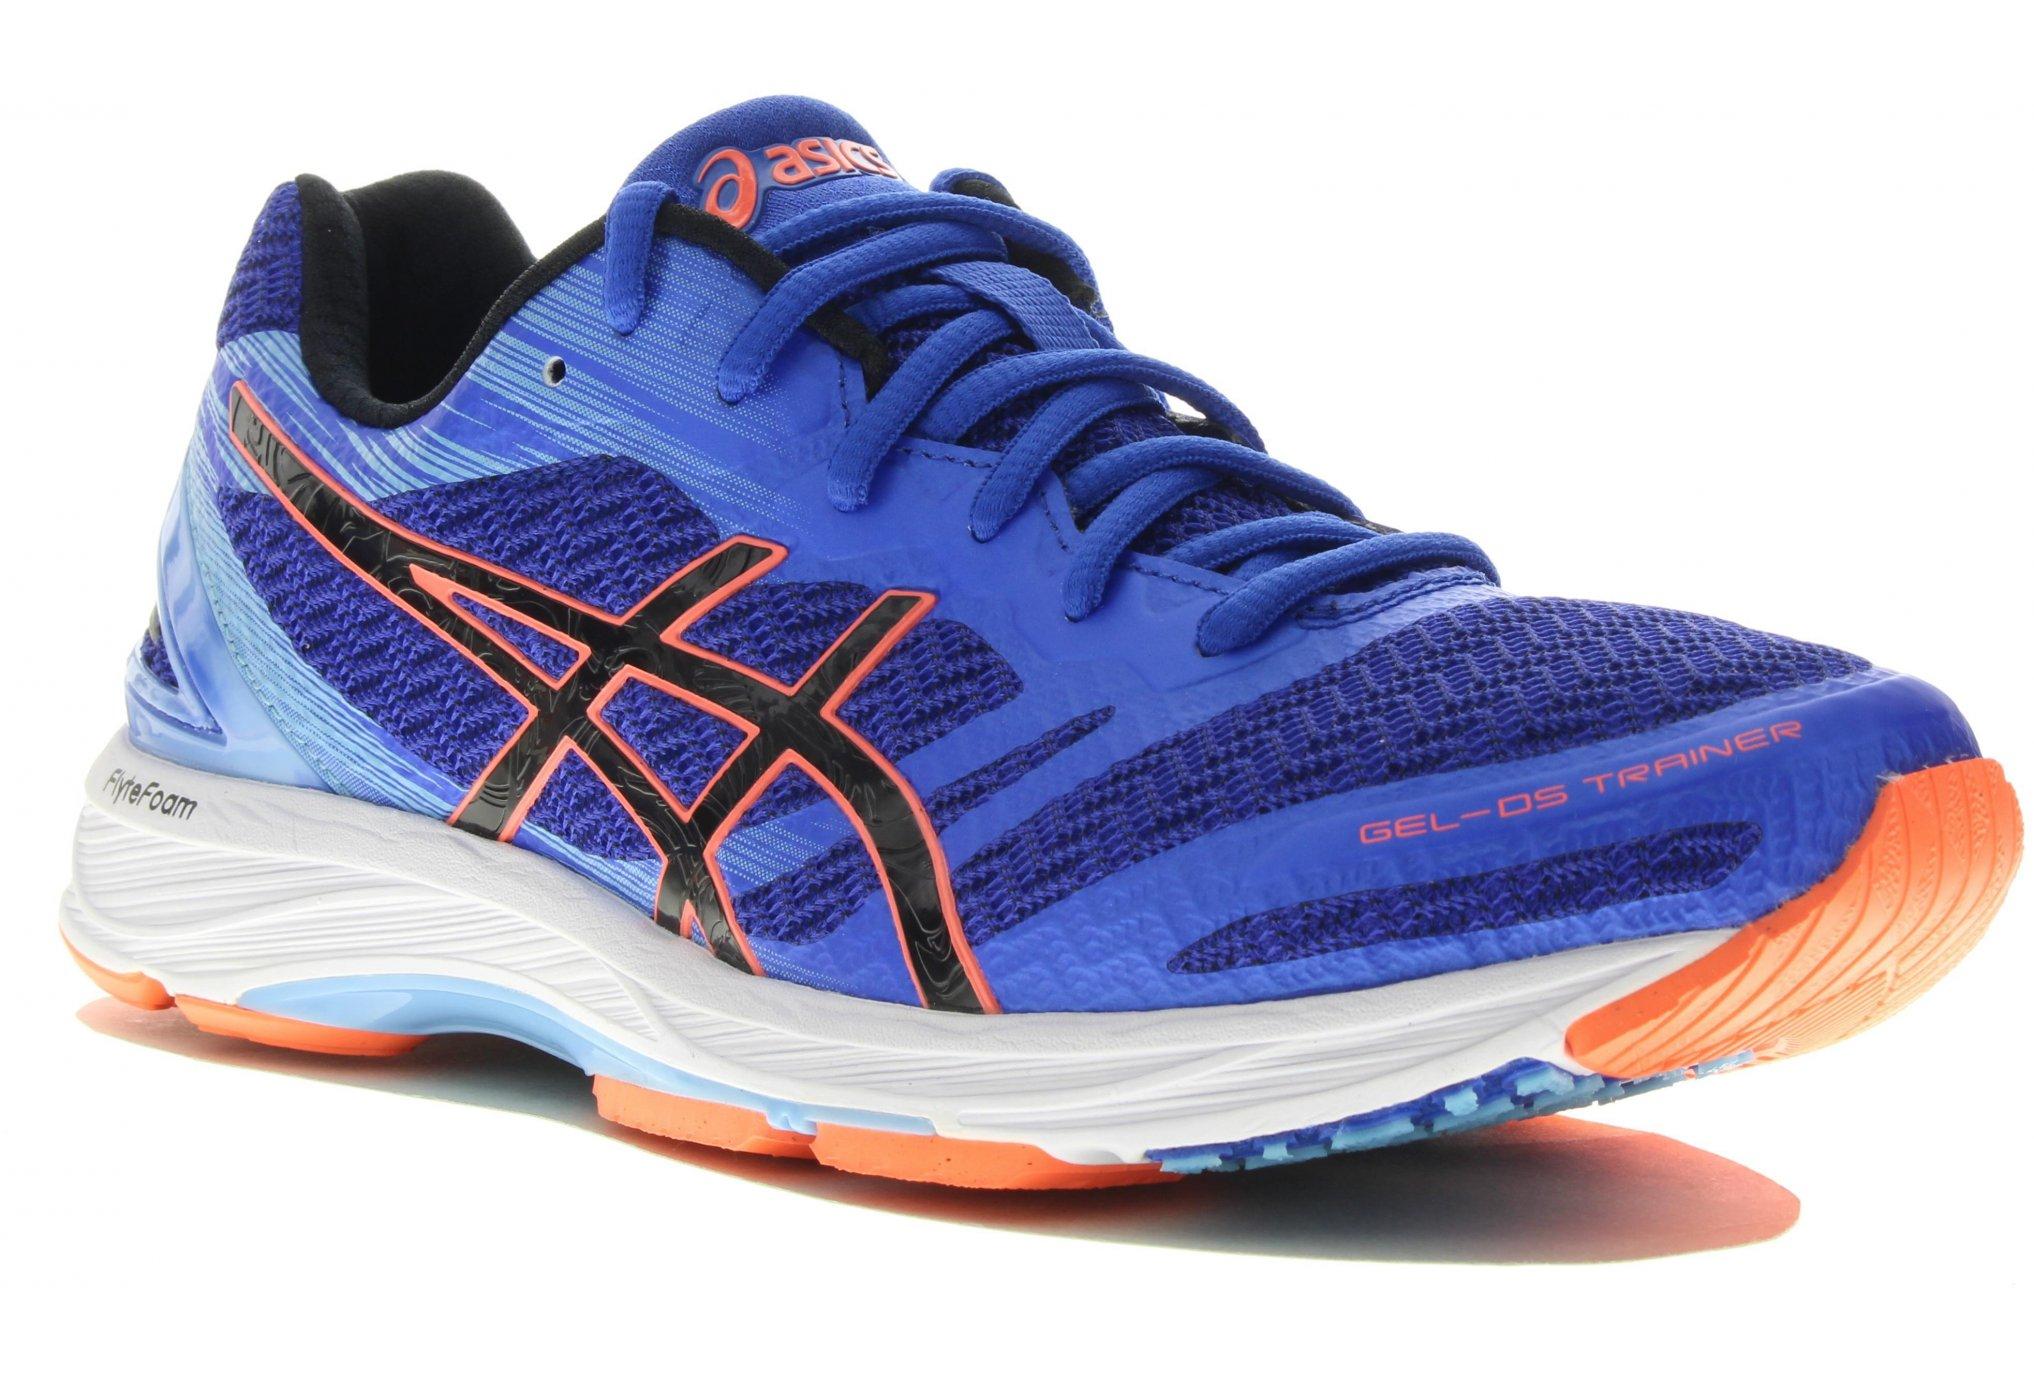 Asics Gel-DS Trainer 22 W Chaussures running femme